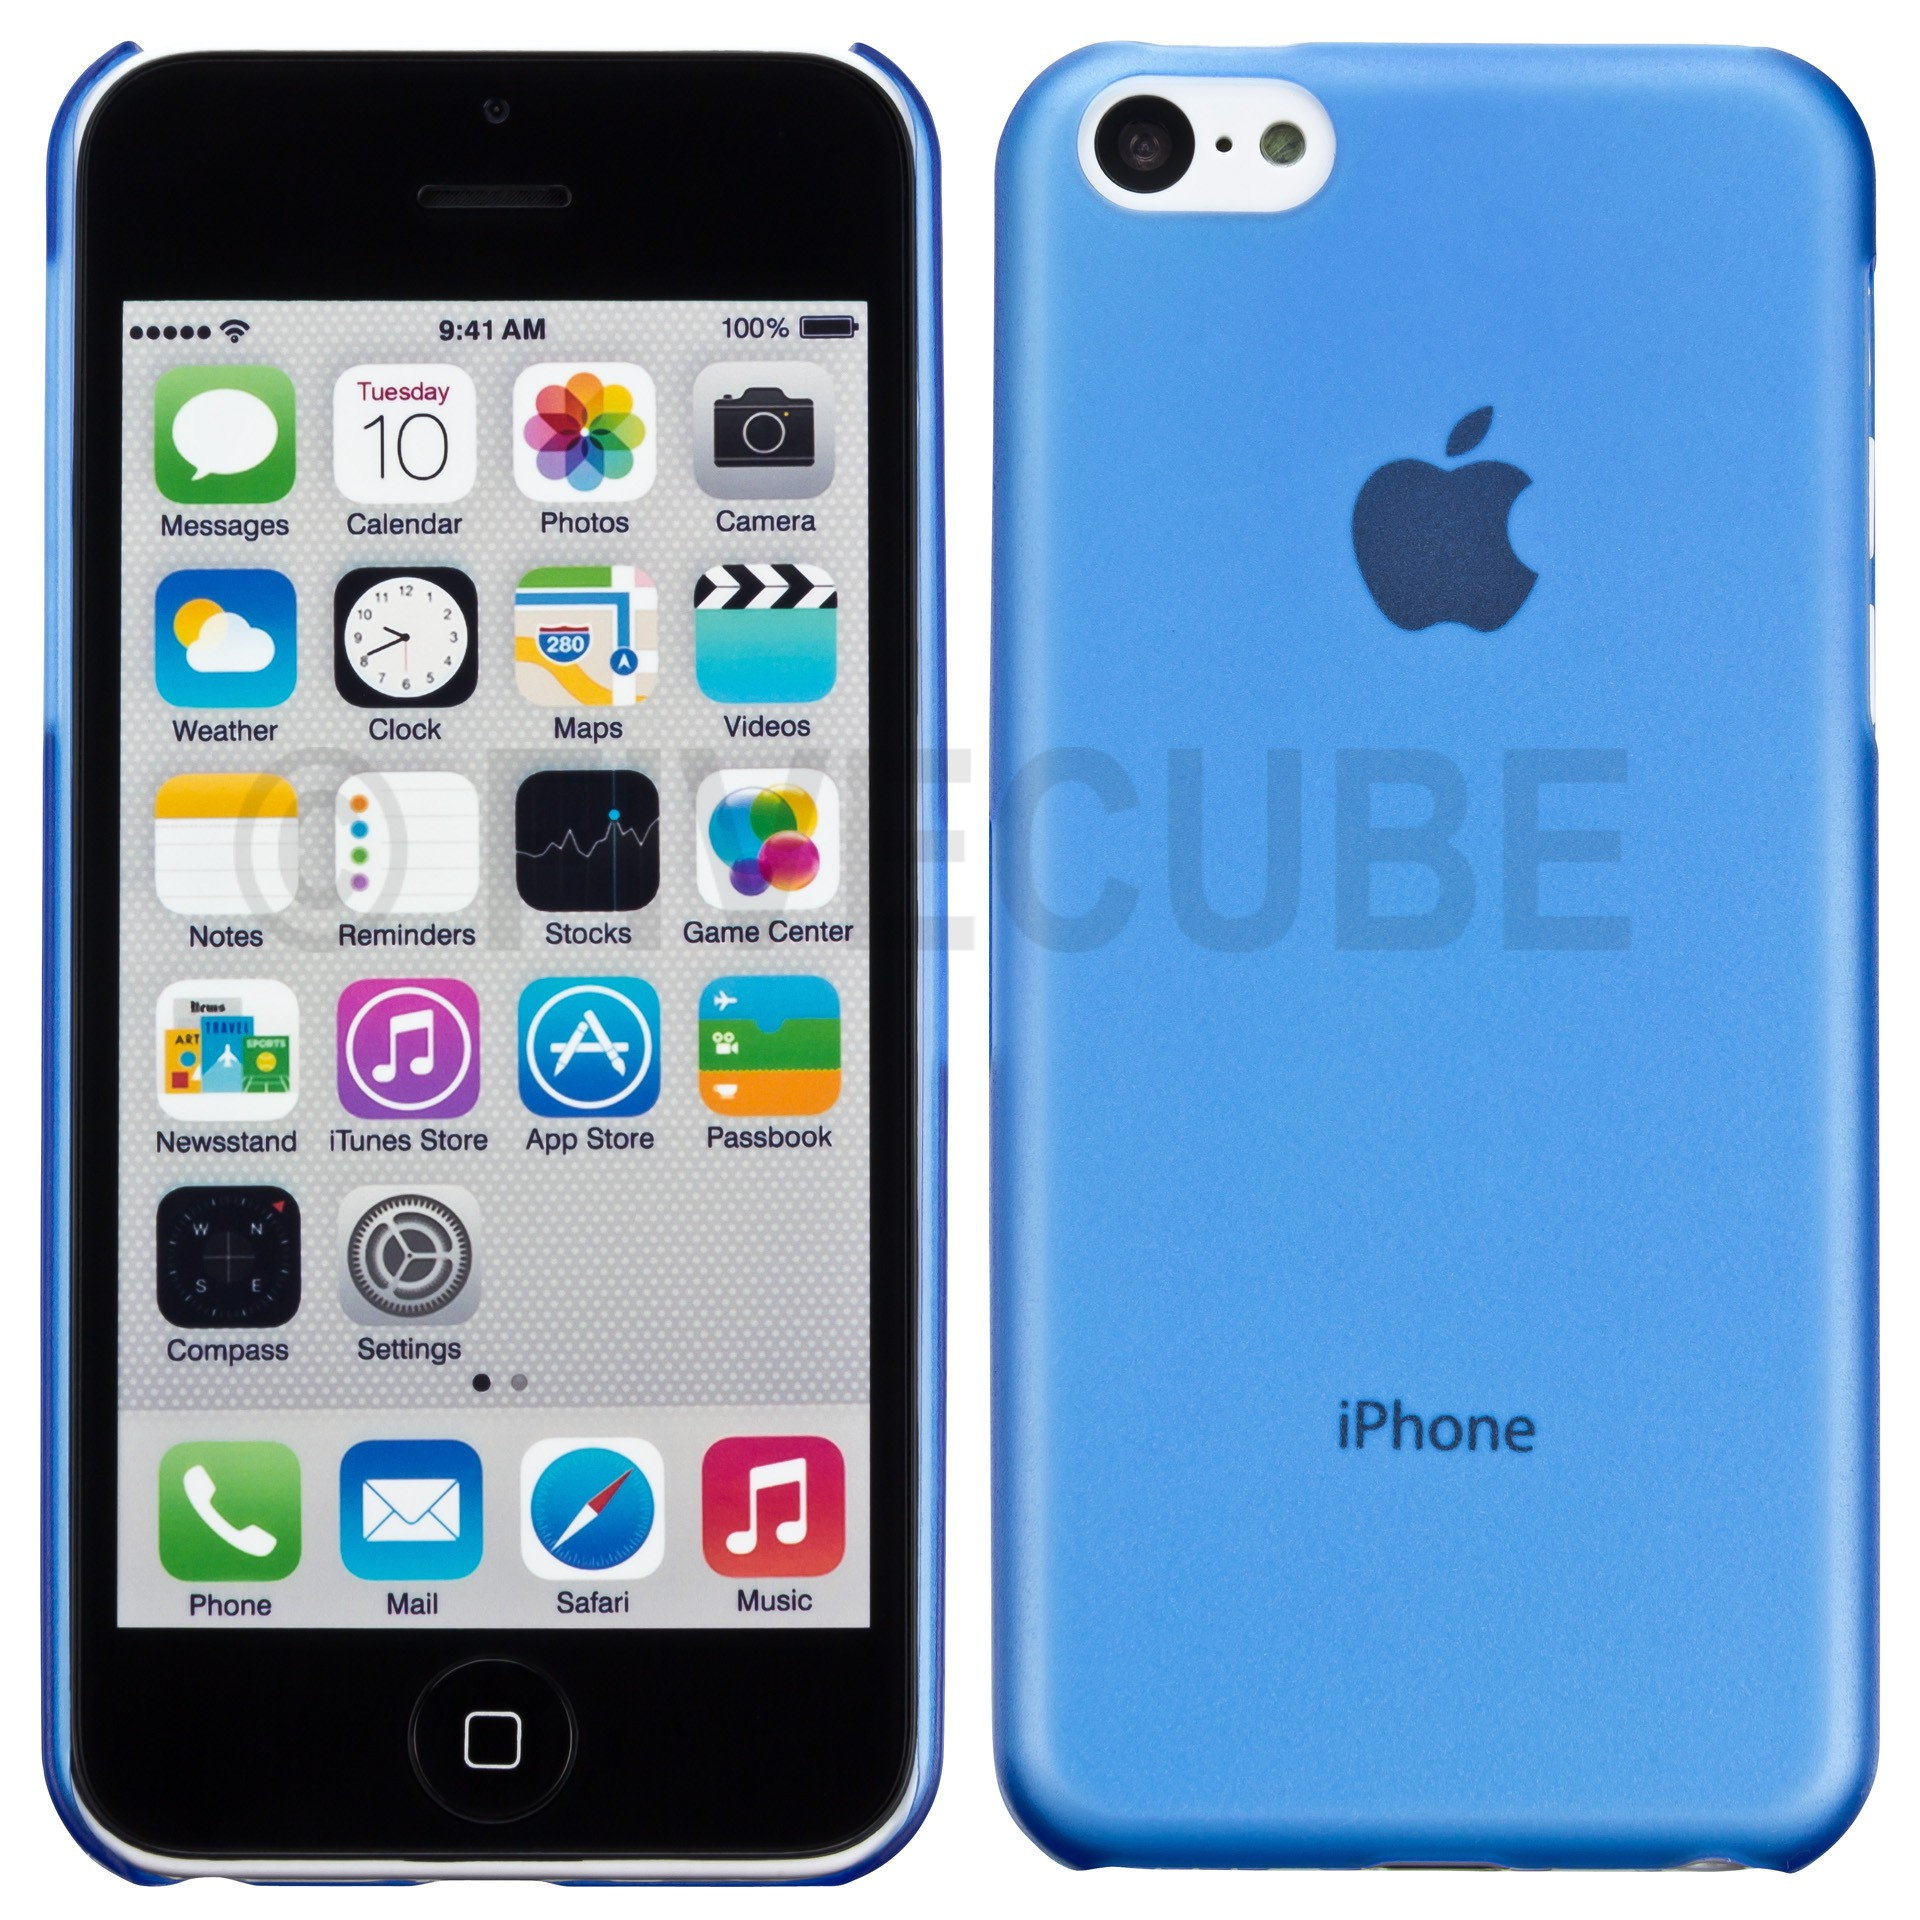 Yemota Pro Slimcase iPhone 5C - Blau